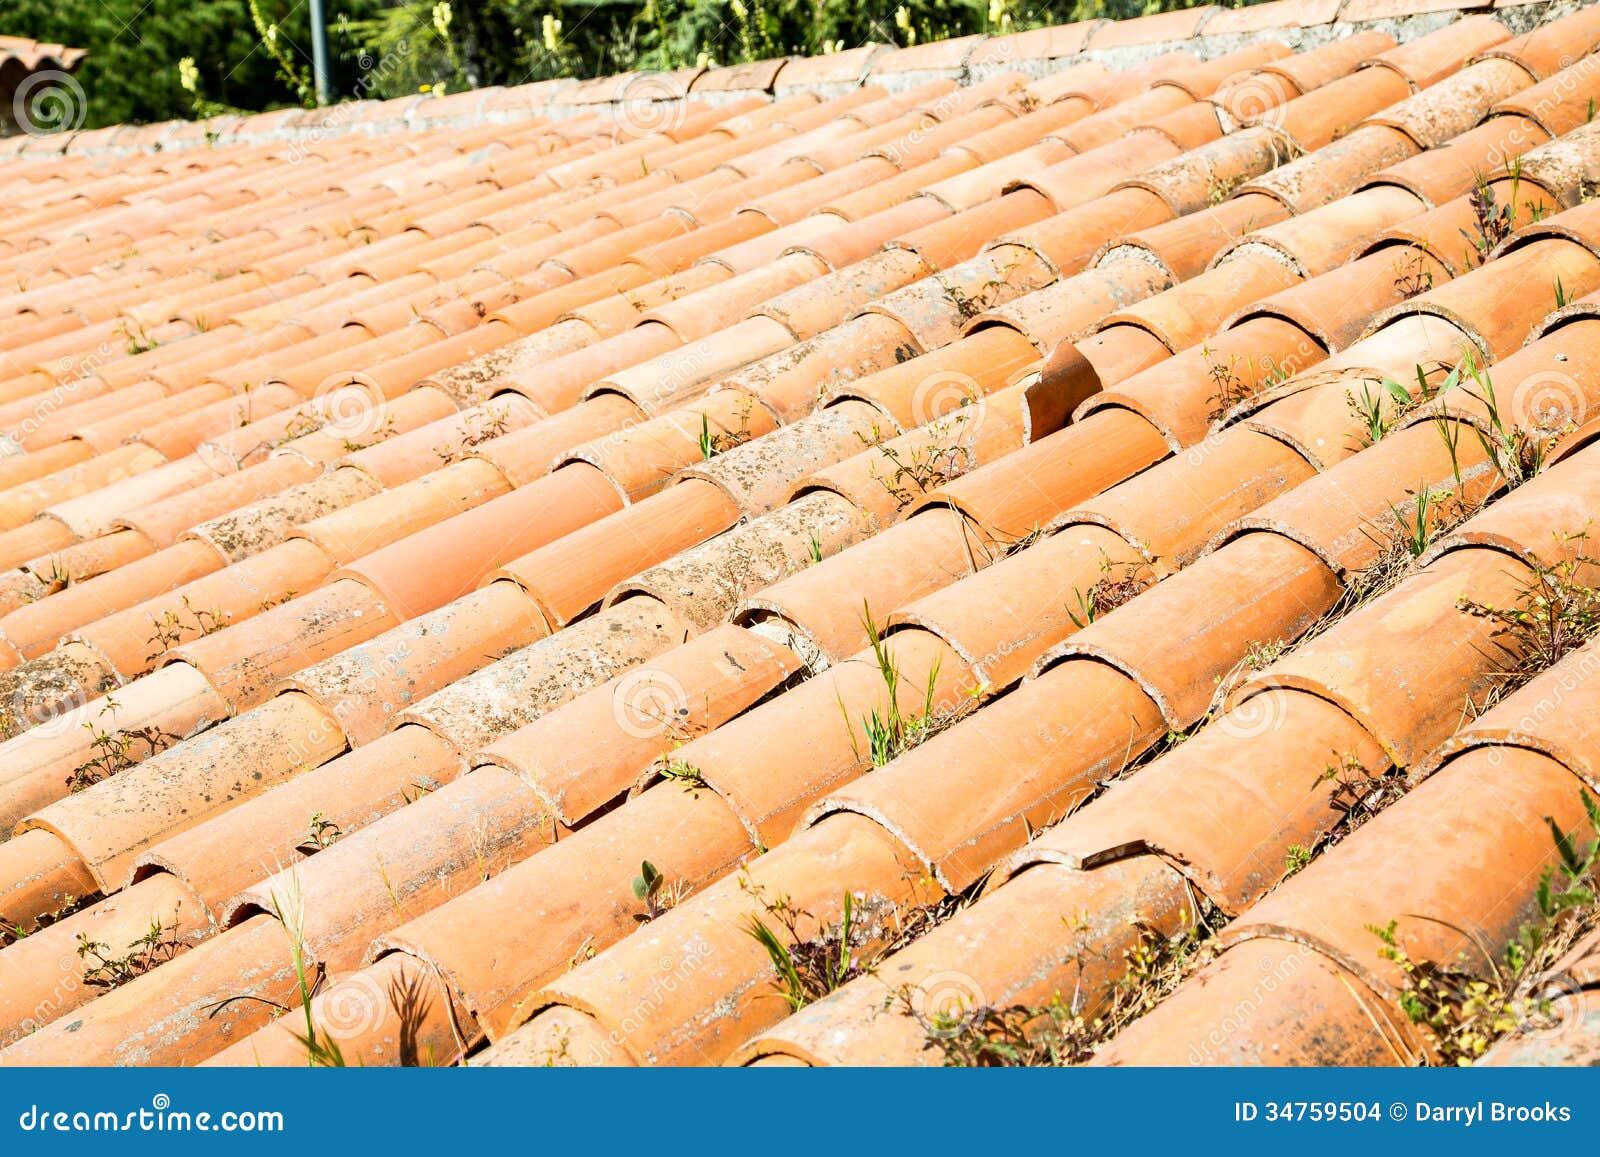 Tile roof old clay tile roof for Clay tile roof